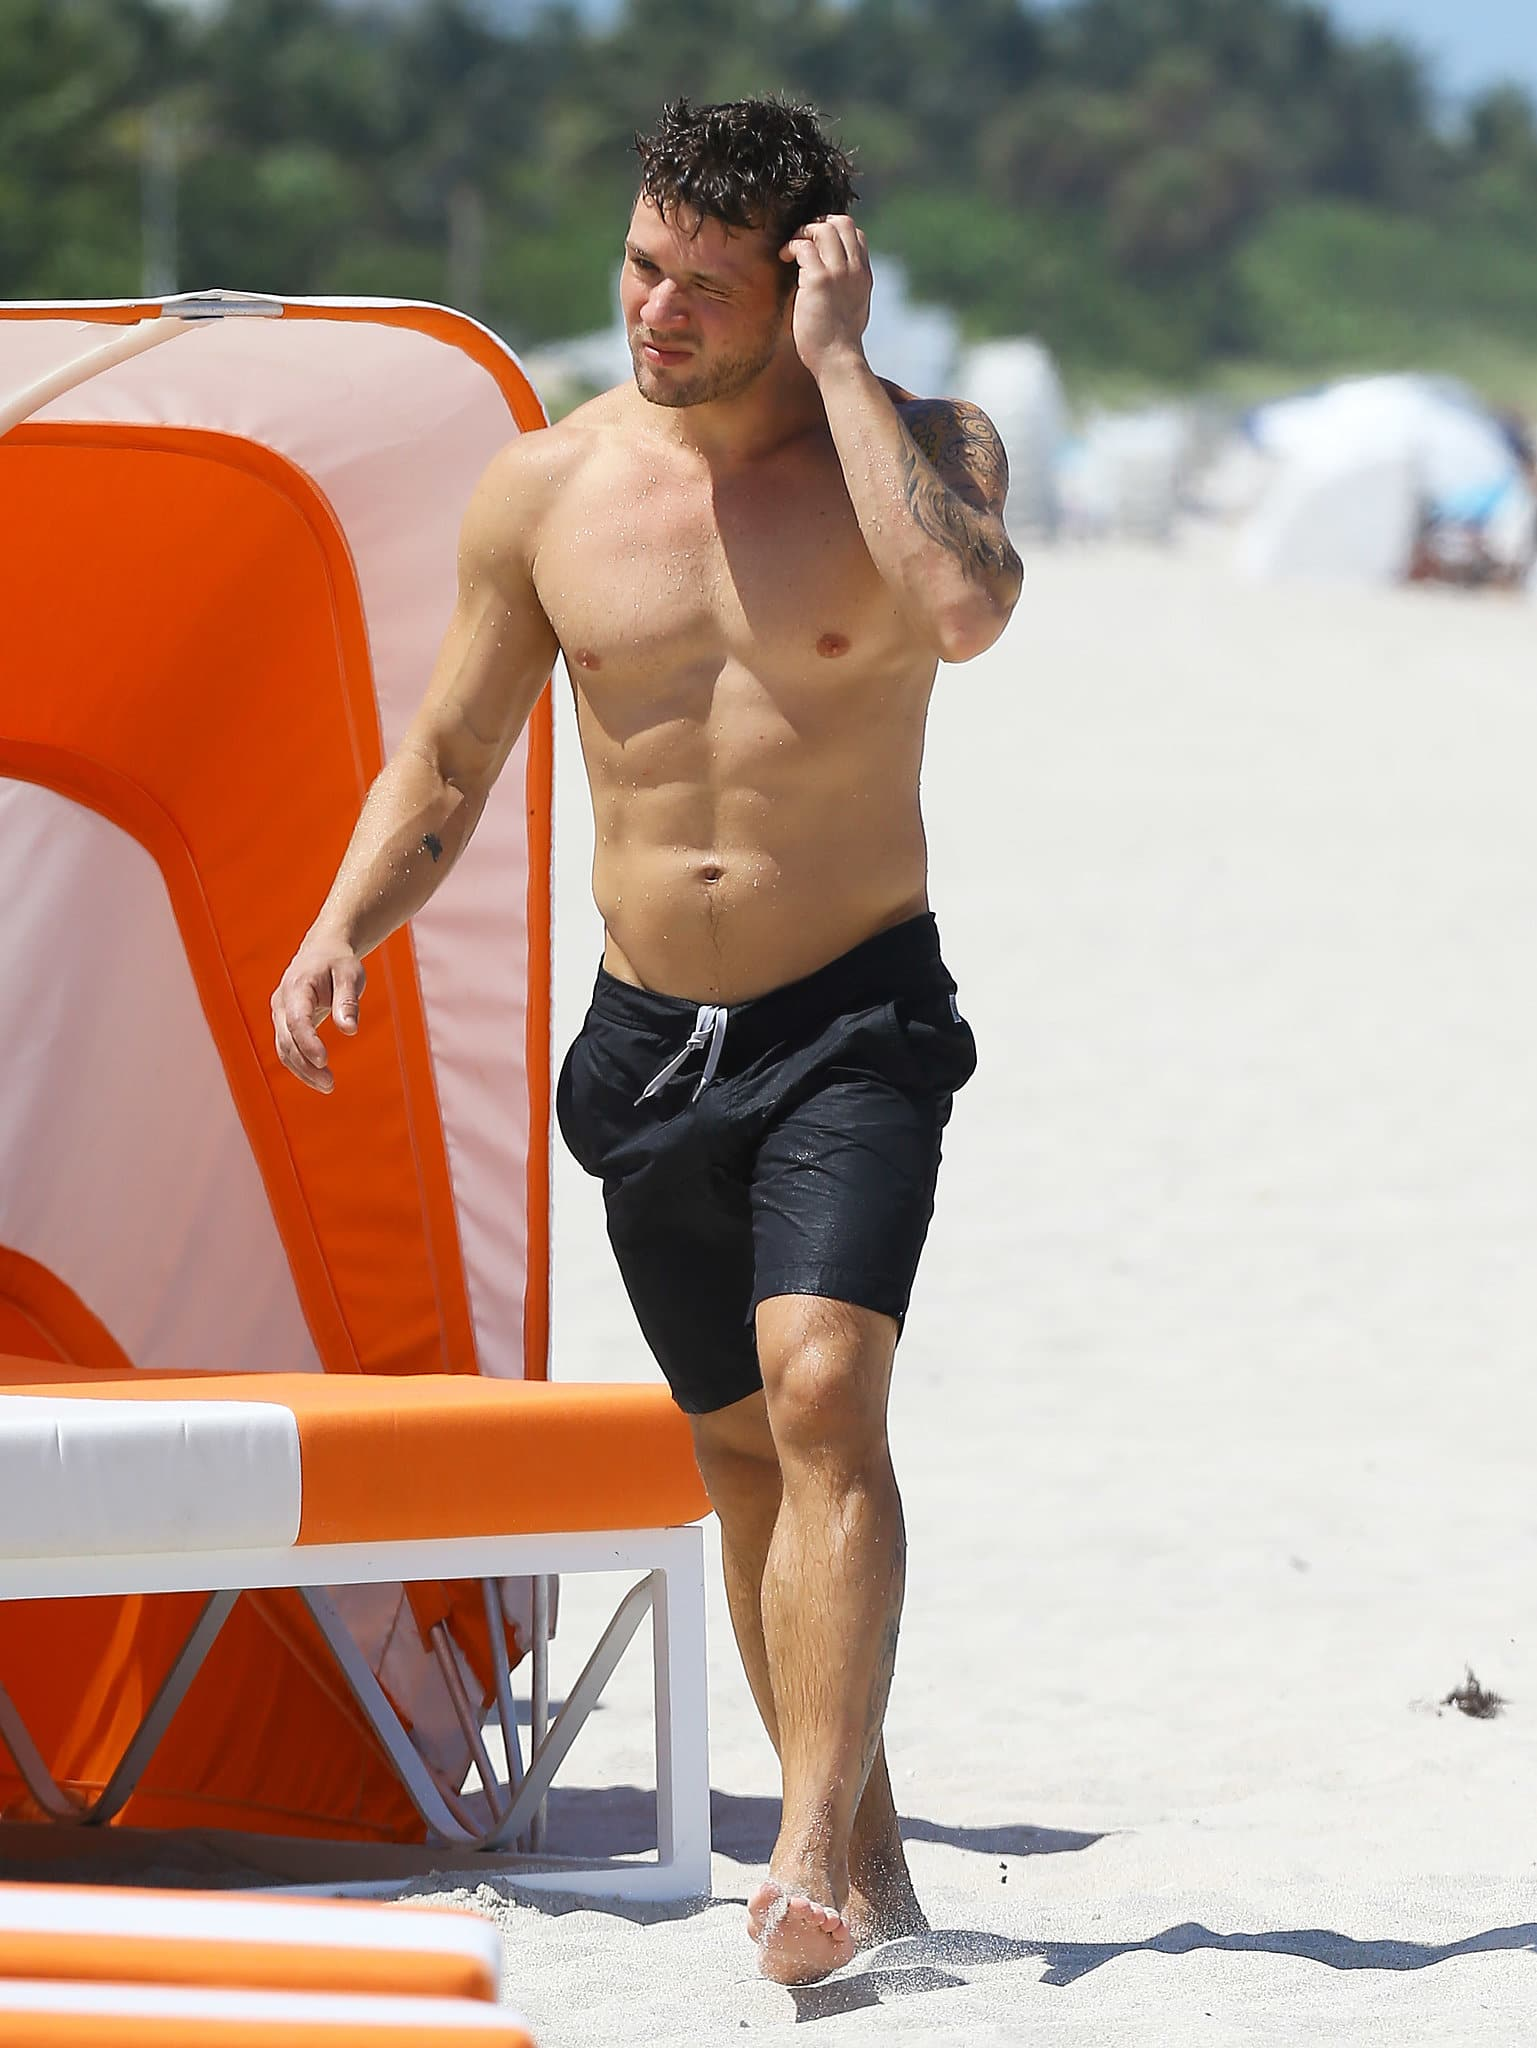 Ryan Phillippe naked shirtless pics (2)